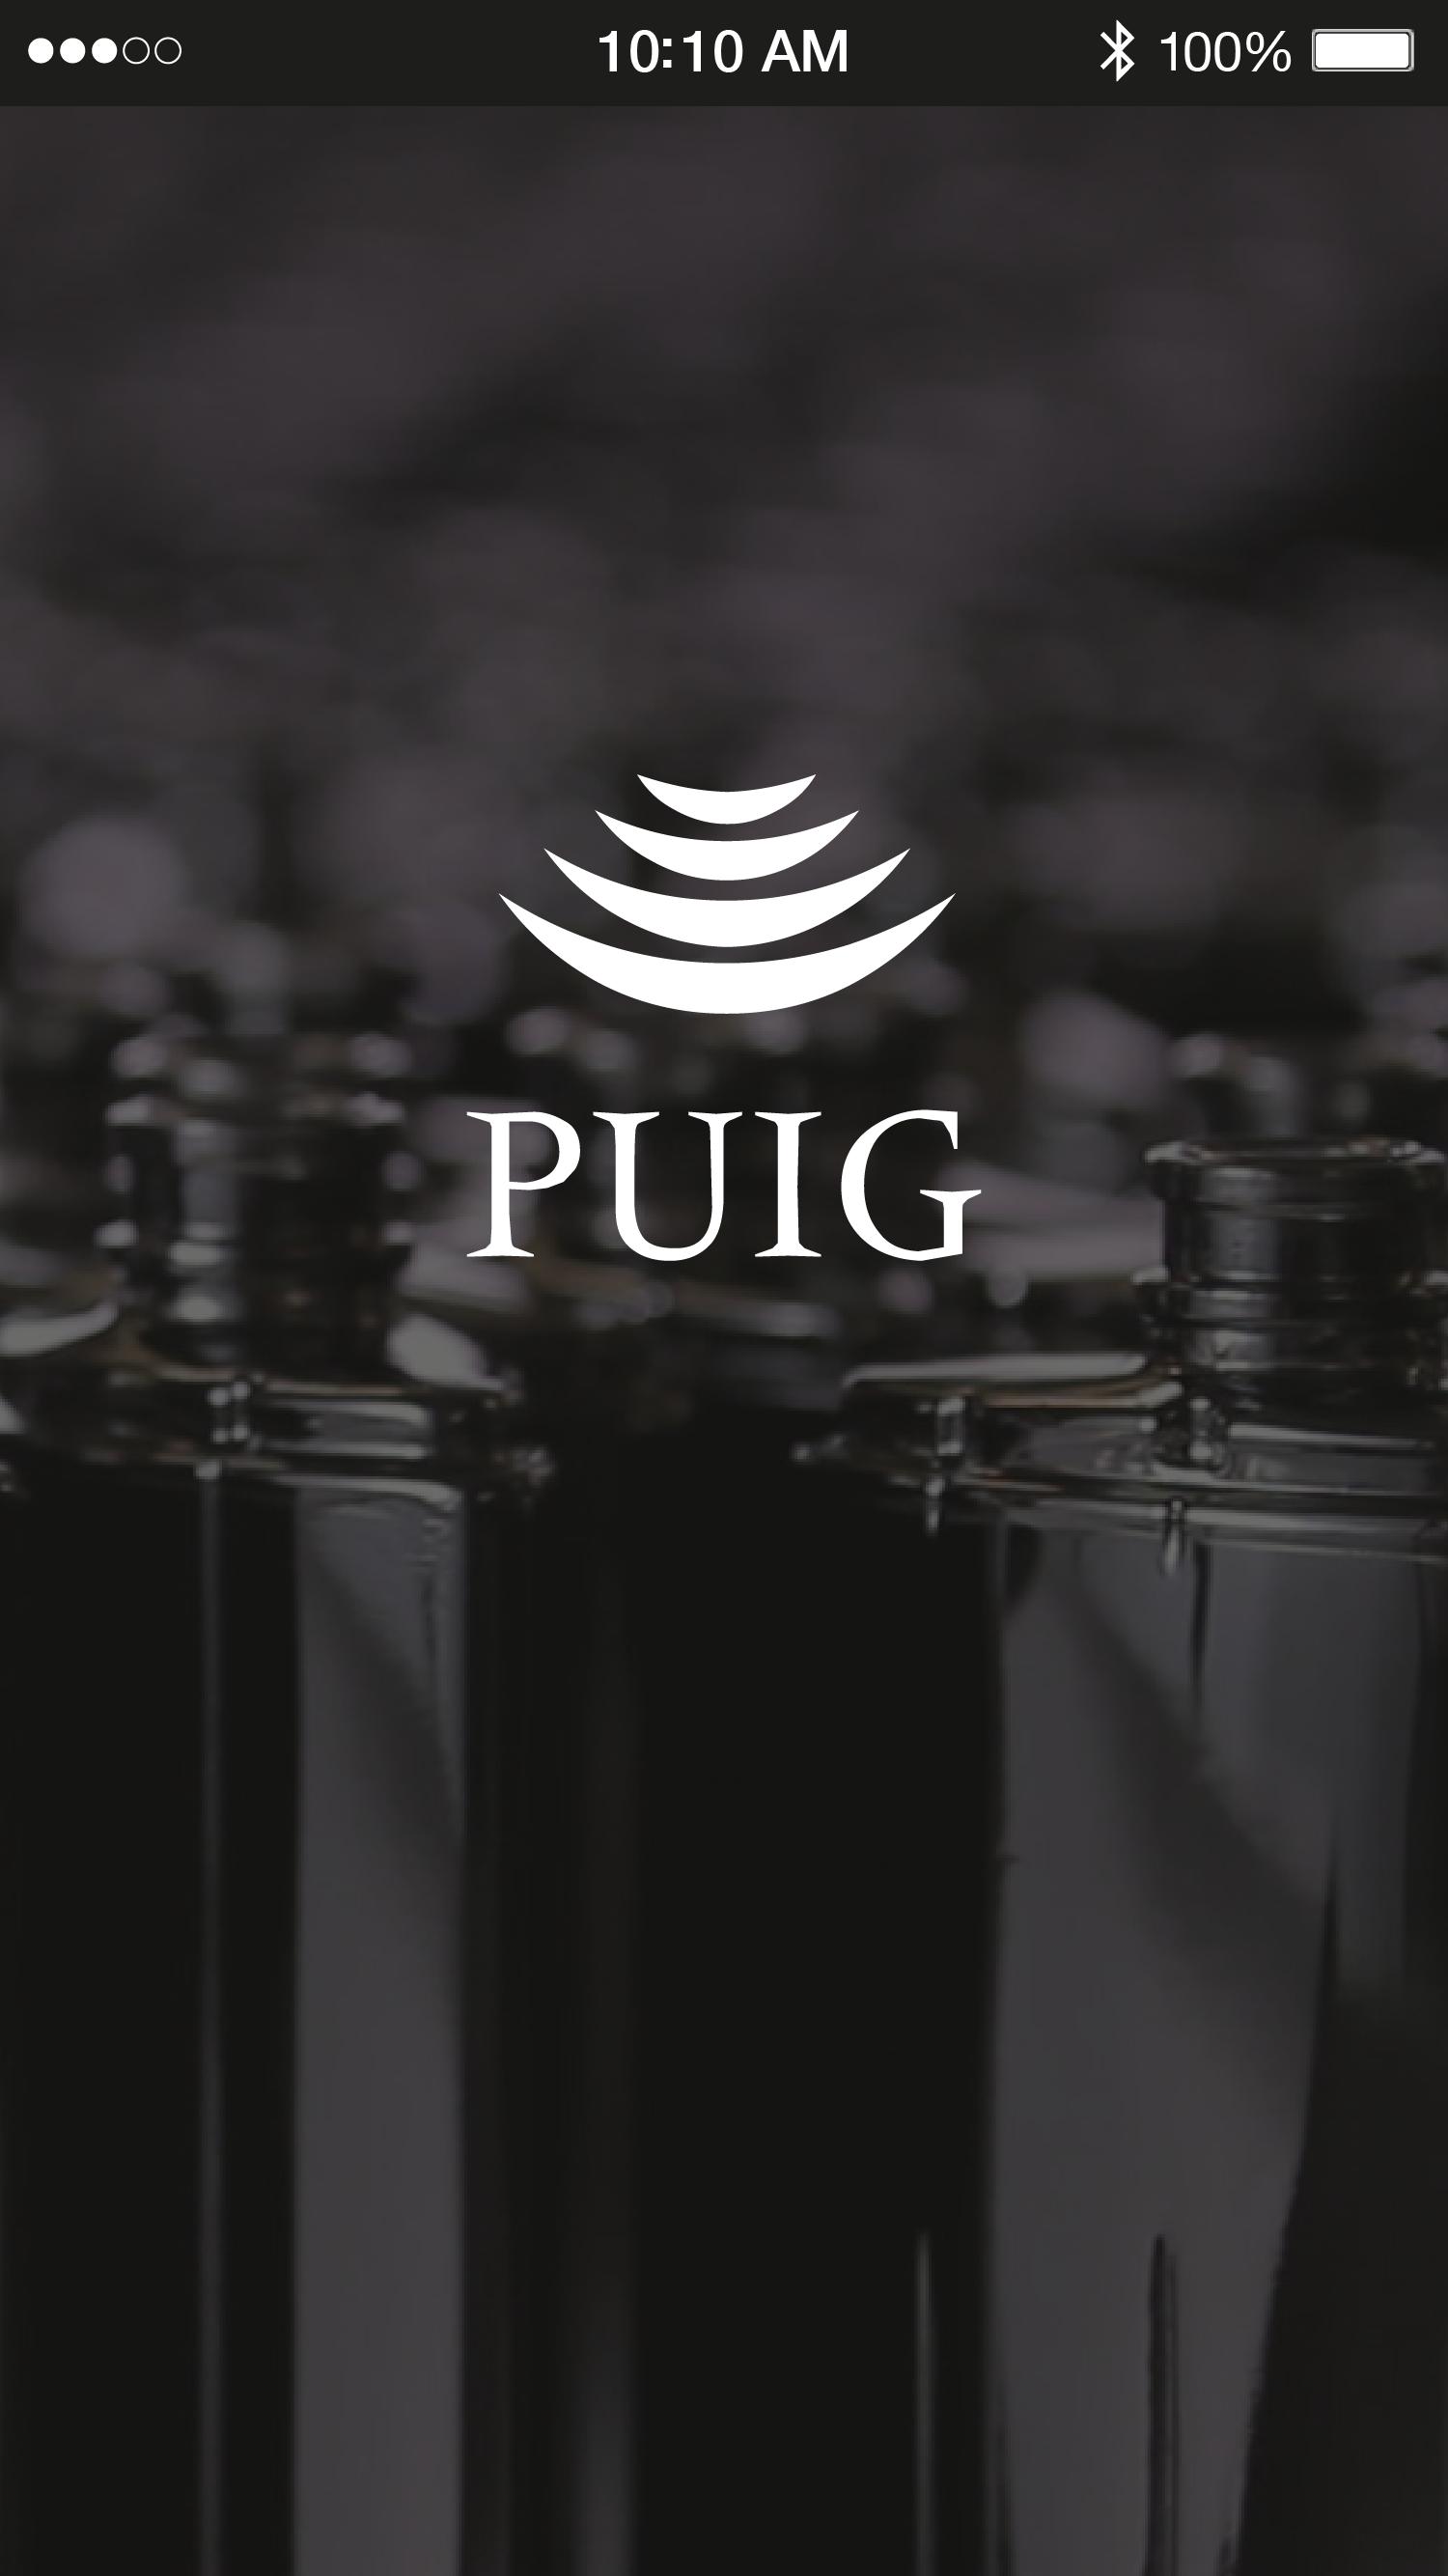 PUIG_01.Loading